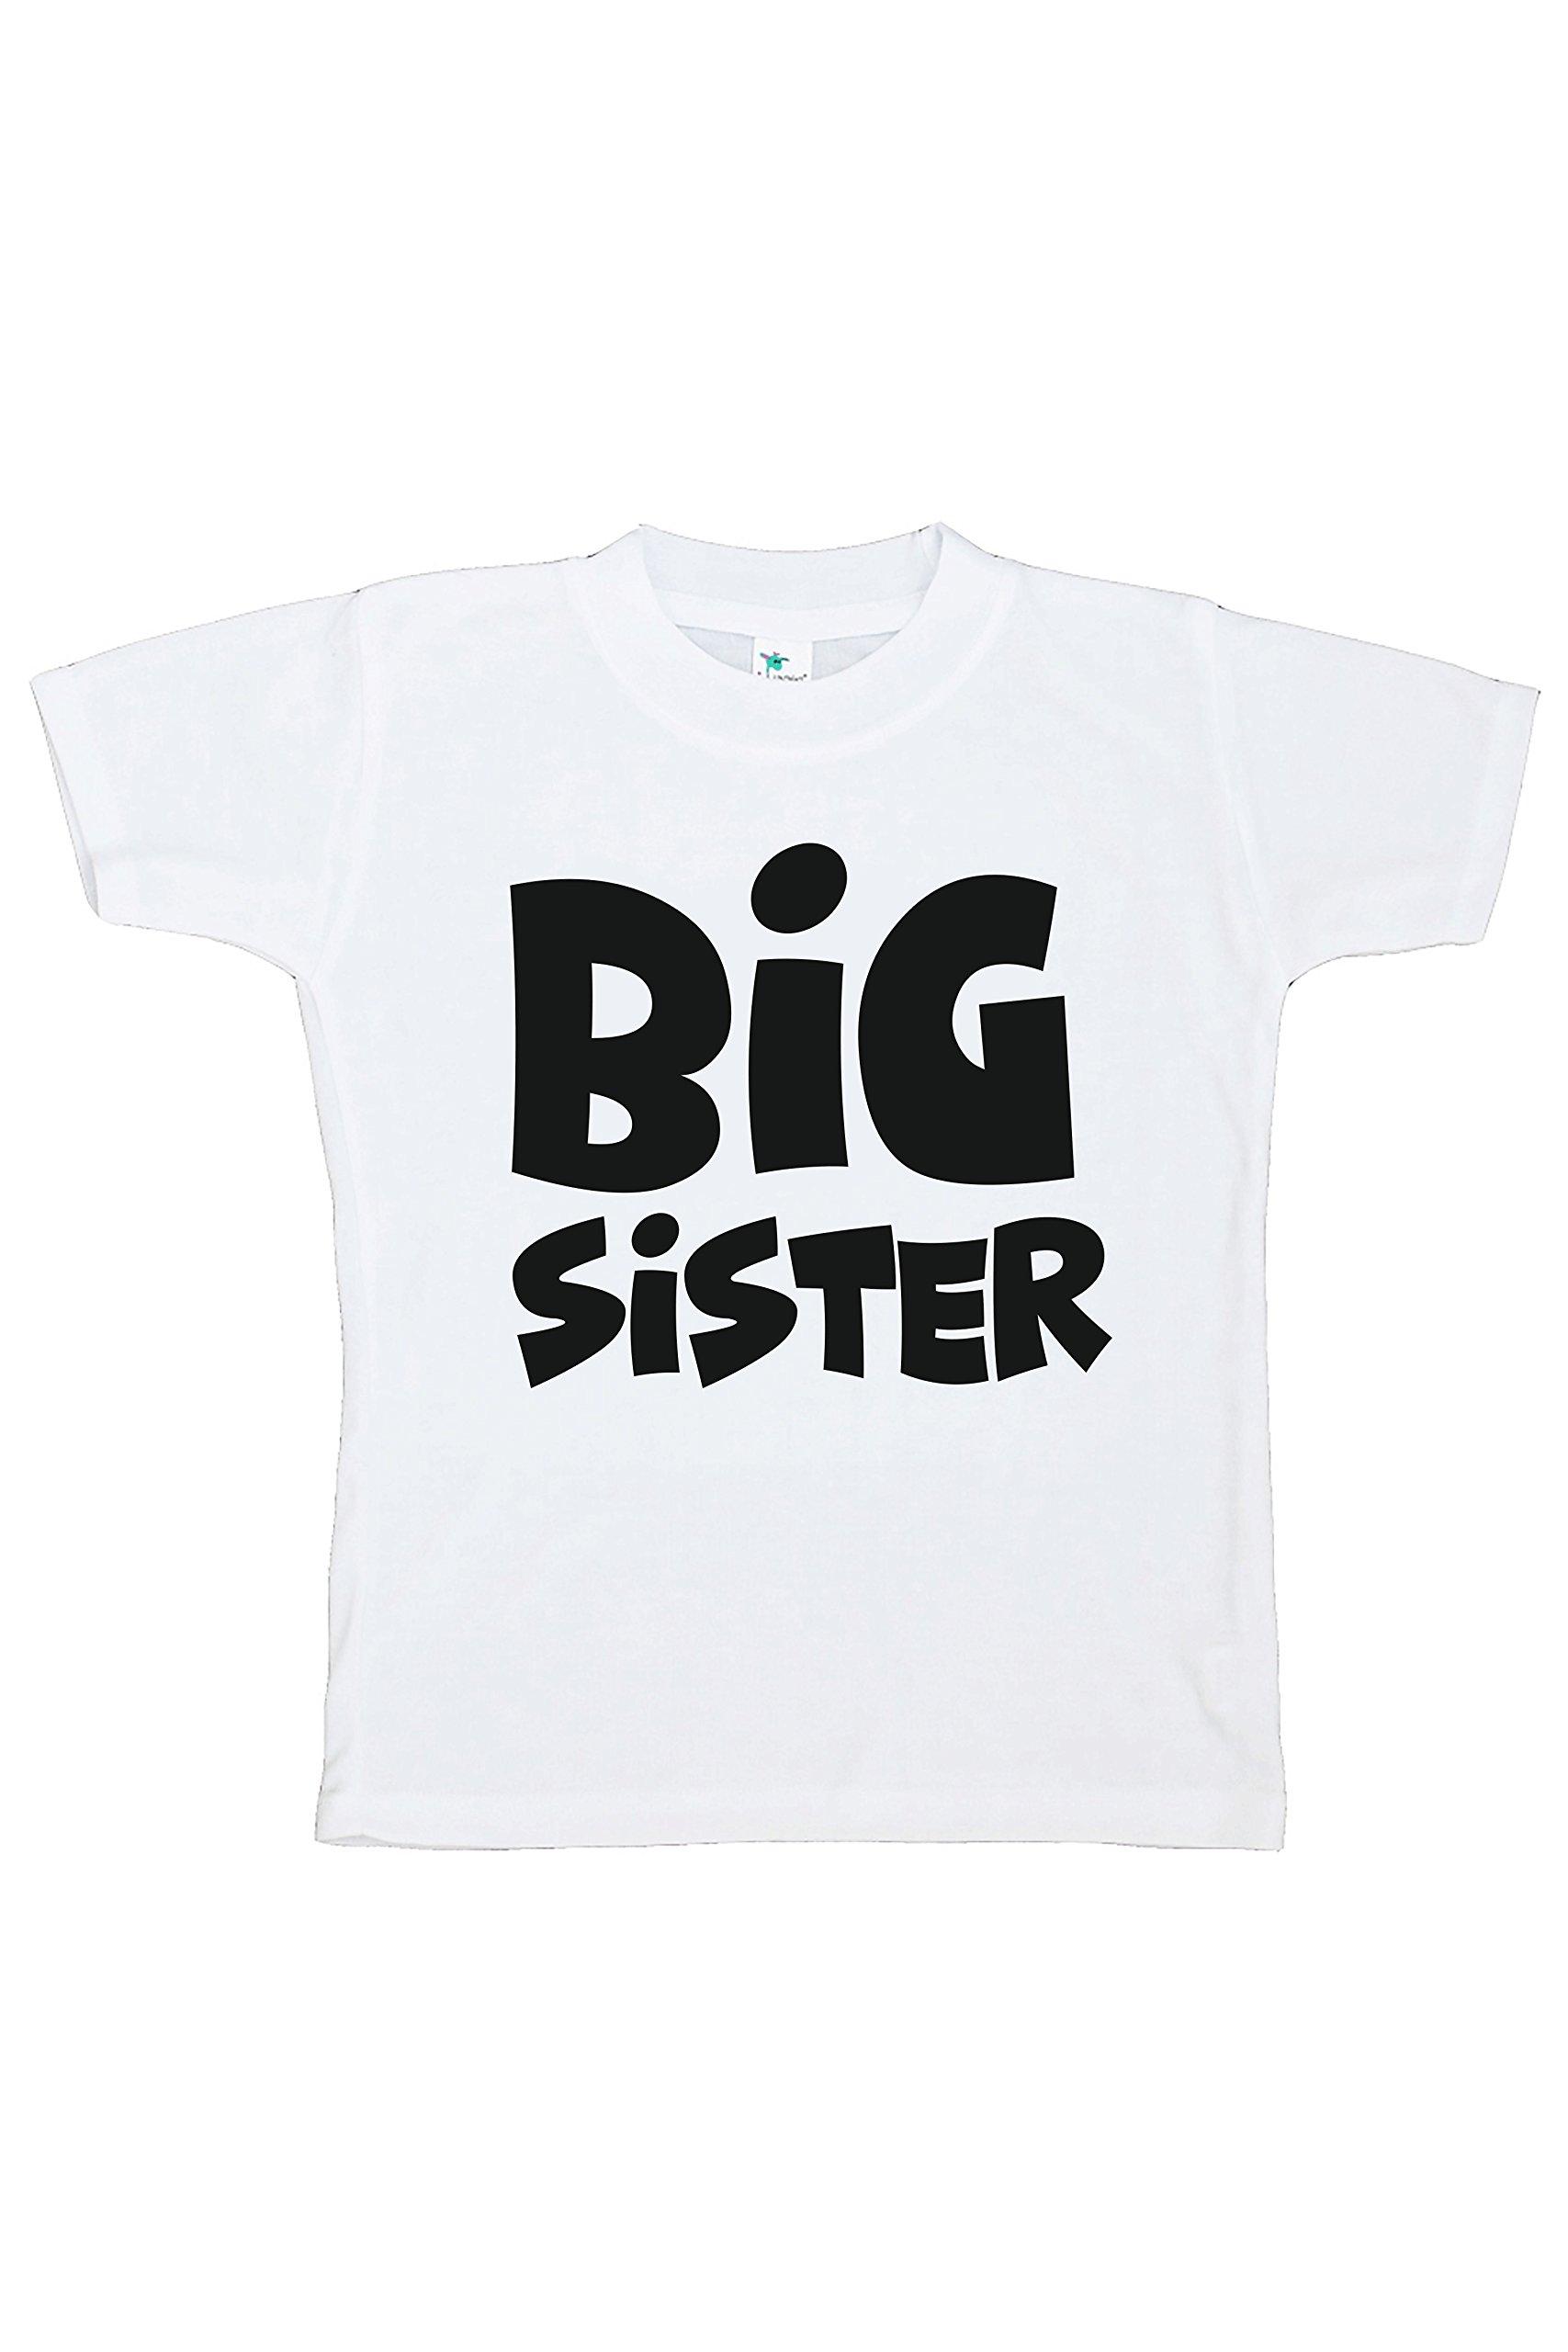 7 ate 9 Apparel Girl's Big Sister T-Shirt